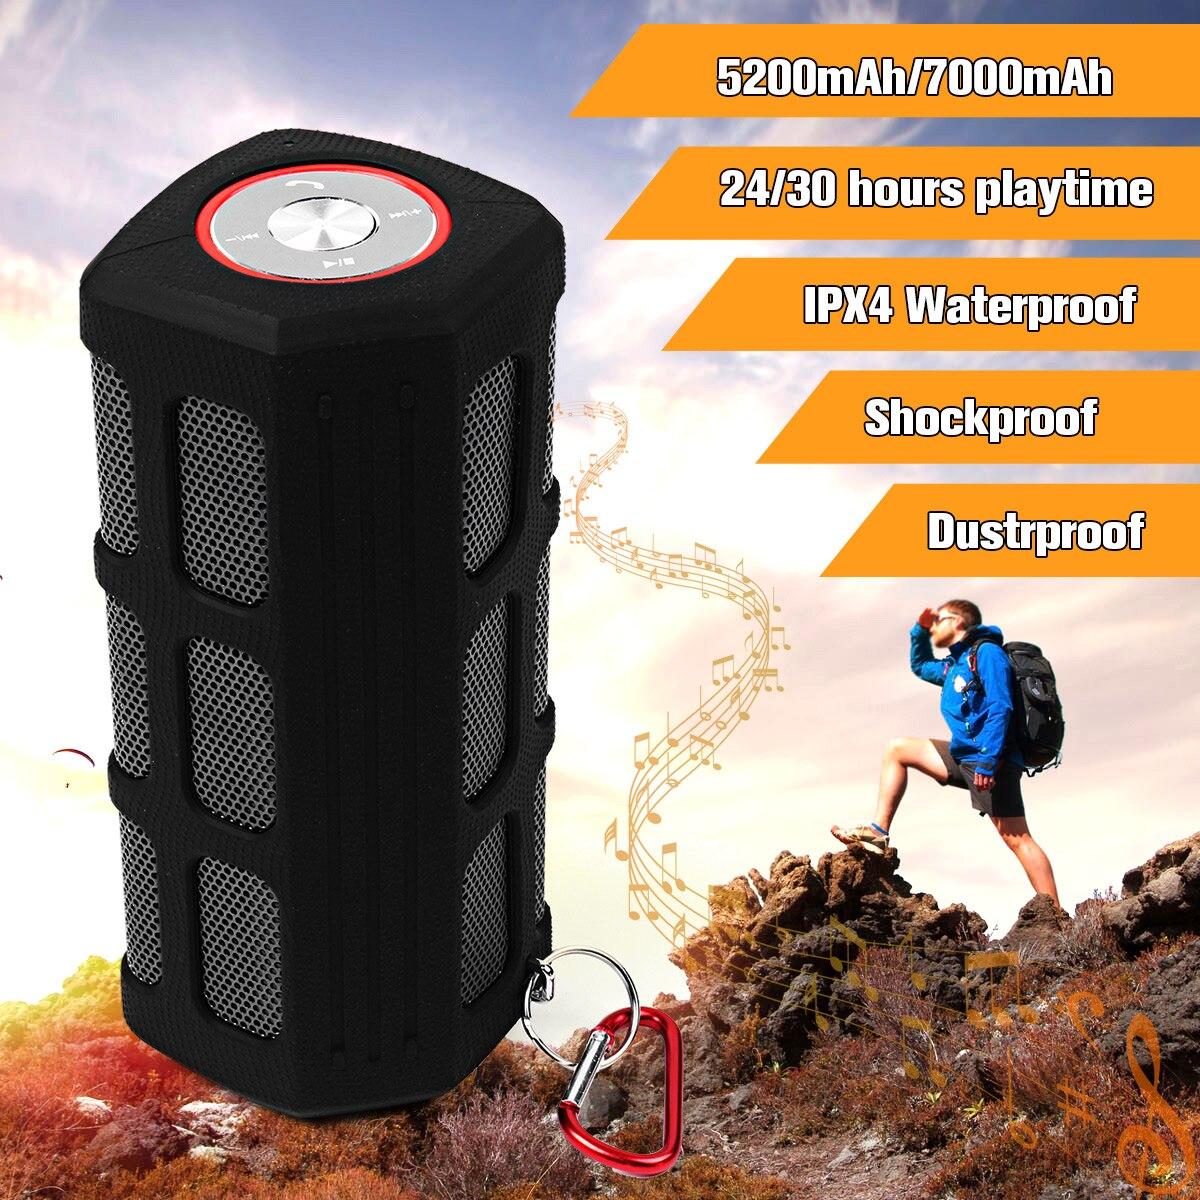 Waterproof Shockproof Dustproof Bluetooth Speakers 5200mAh/7000mAh Power Bank Wireless Outdoor Sports Portable Subwoofer стоимость